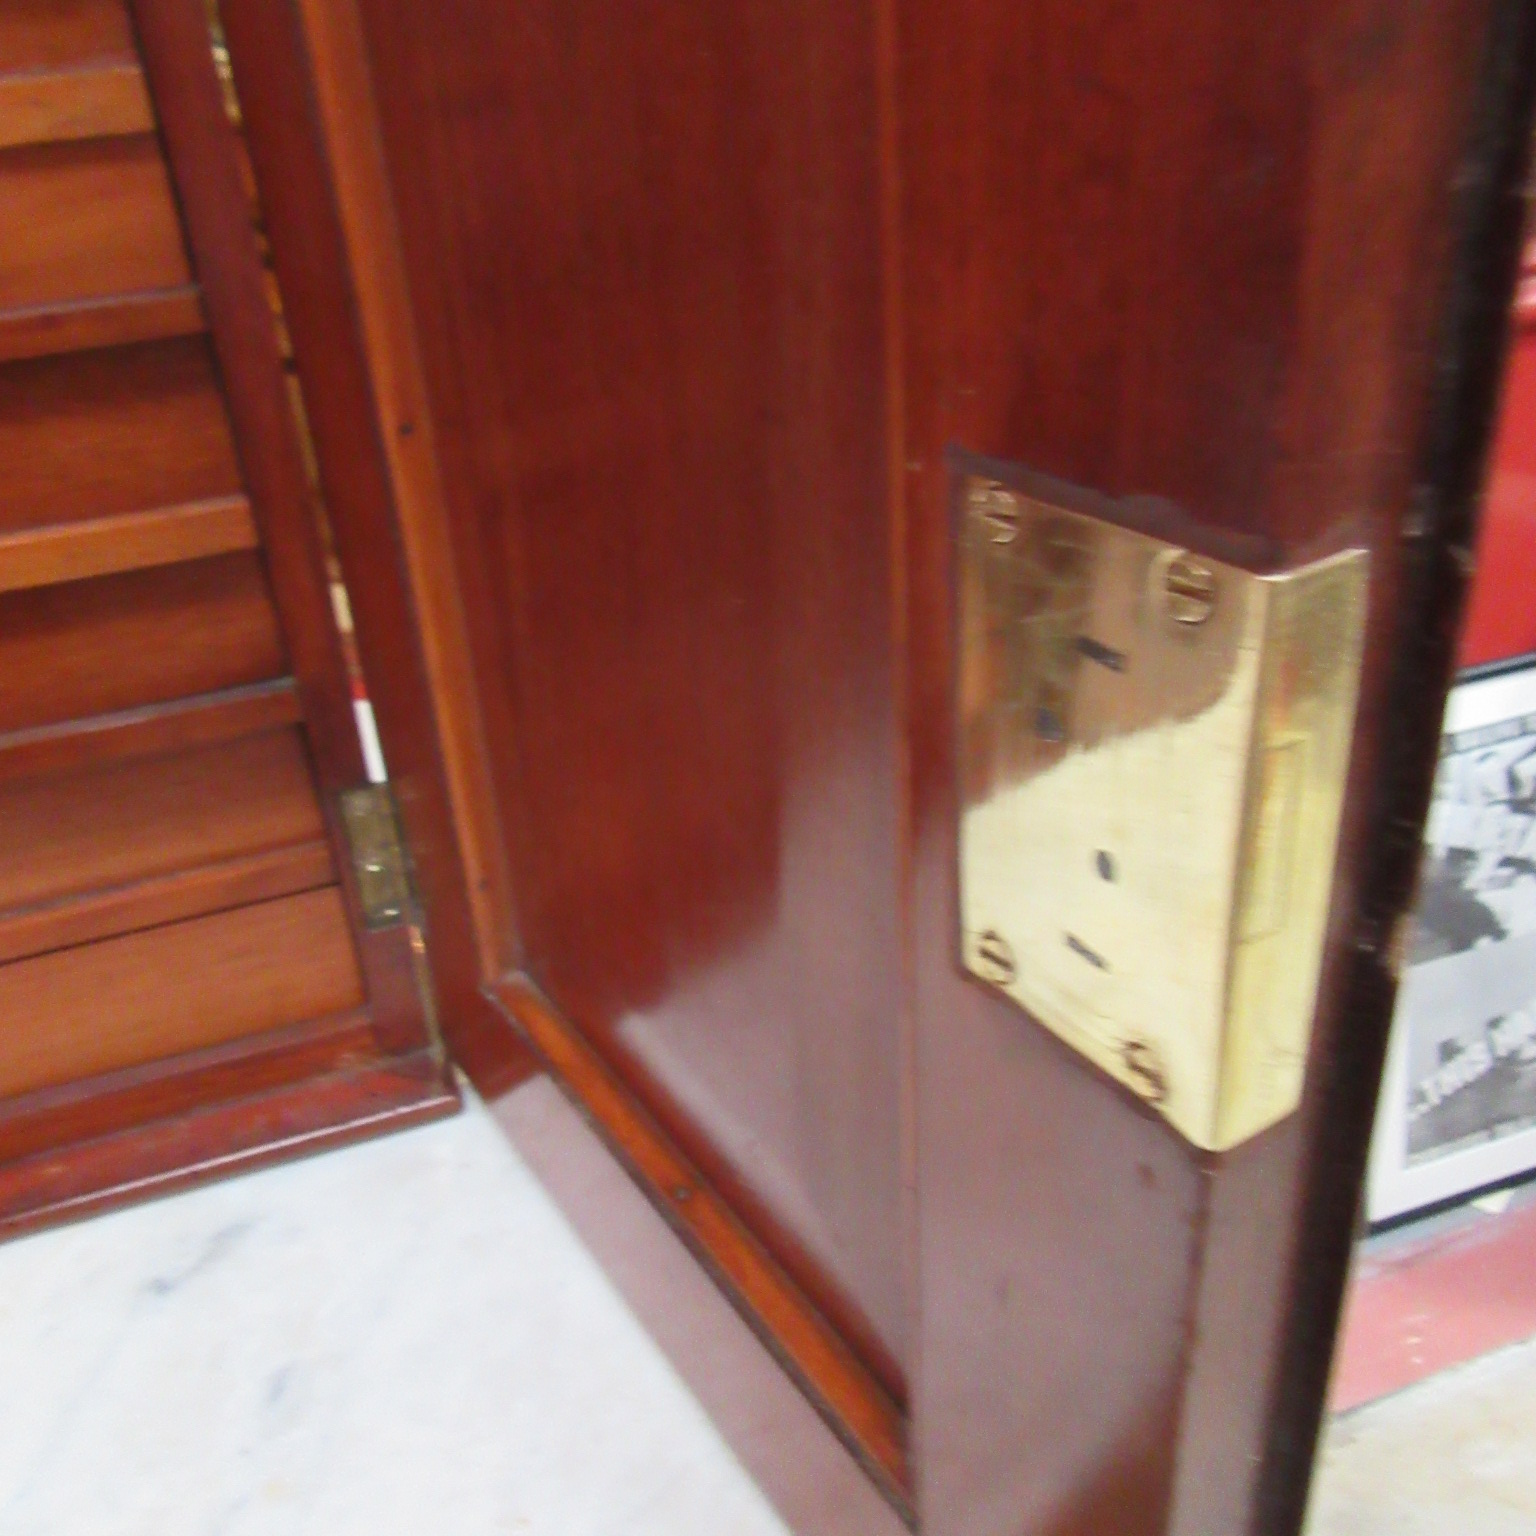 Related Antiques - ANTIQUE VICTORIAN MAHOGANY COLLECTORS CABINET - Eras Of  Style Eras - Antique Collectors Cabinet Antique Furniture